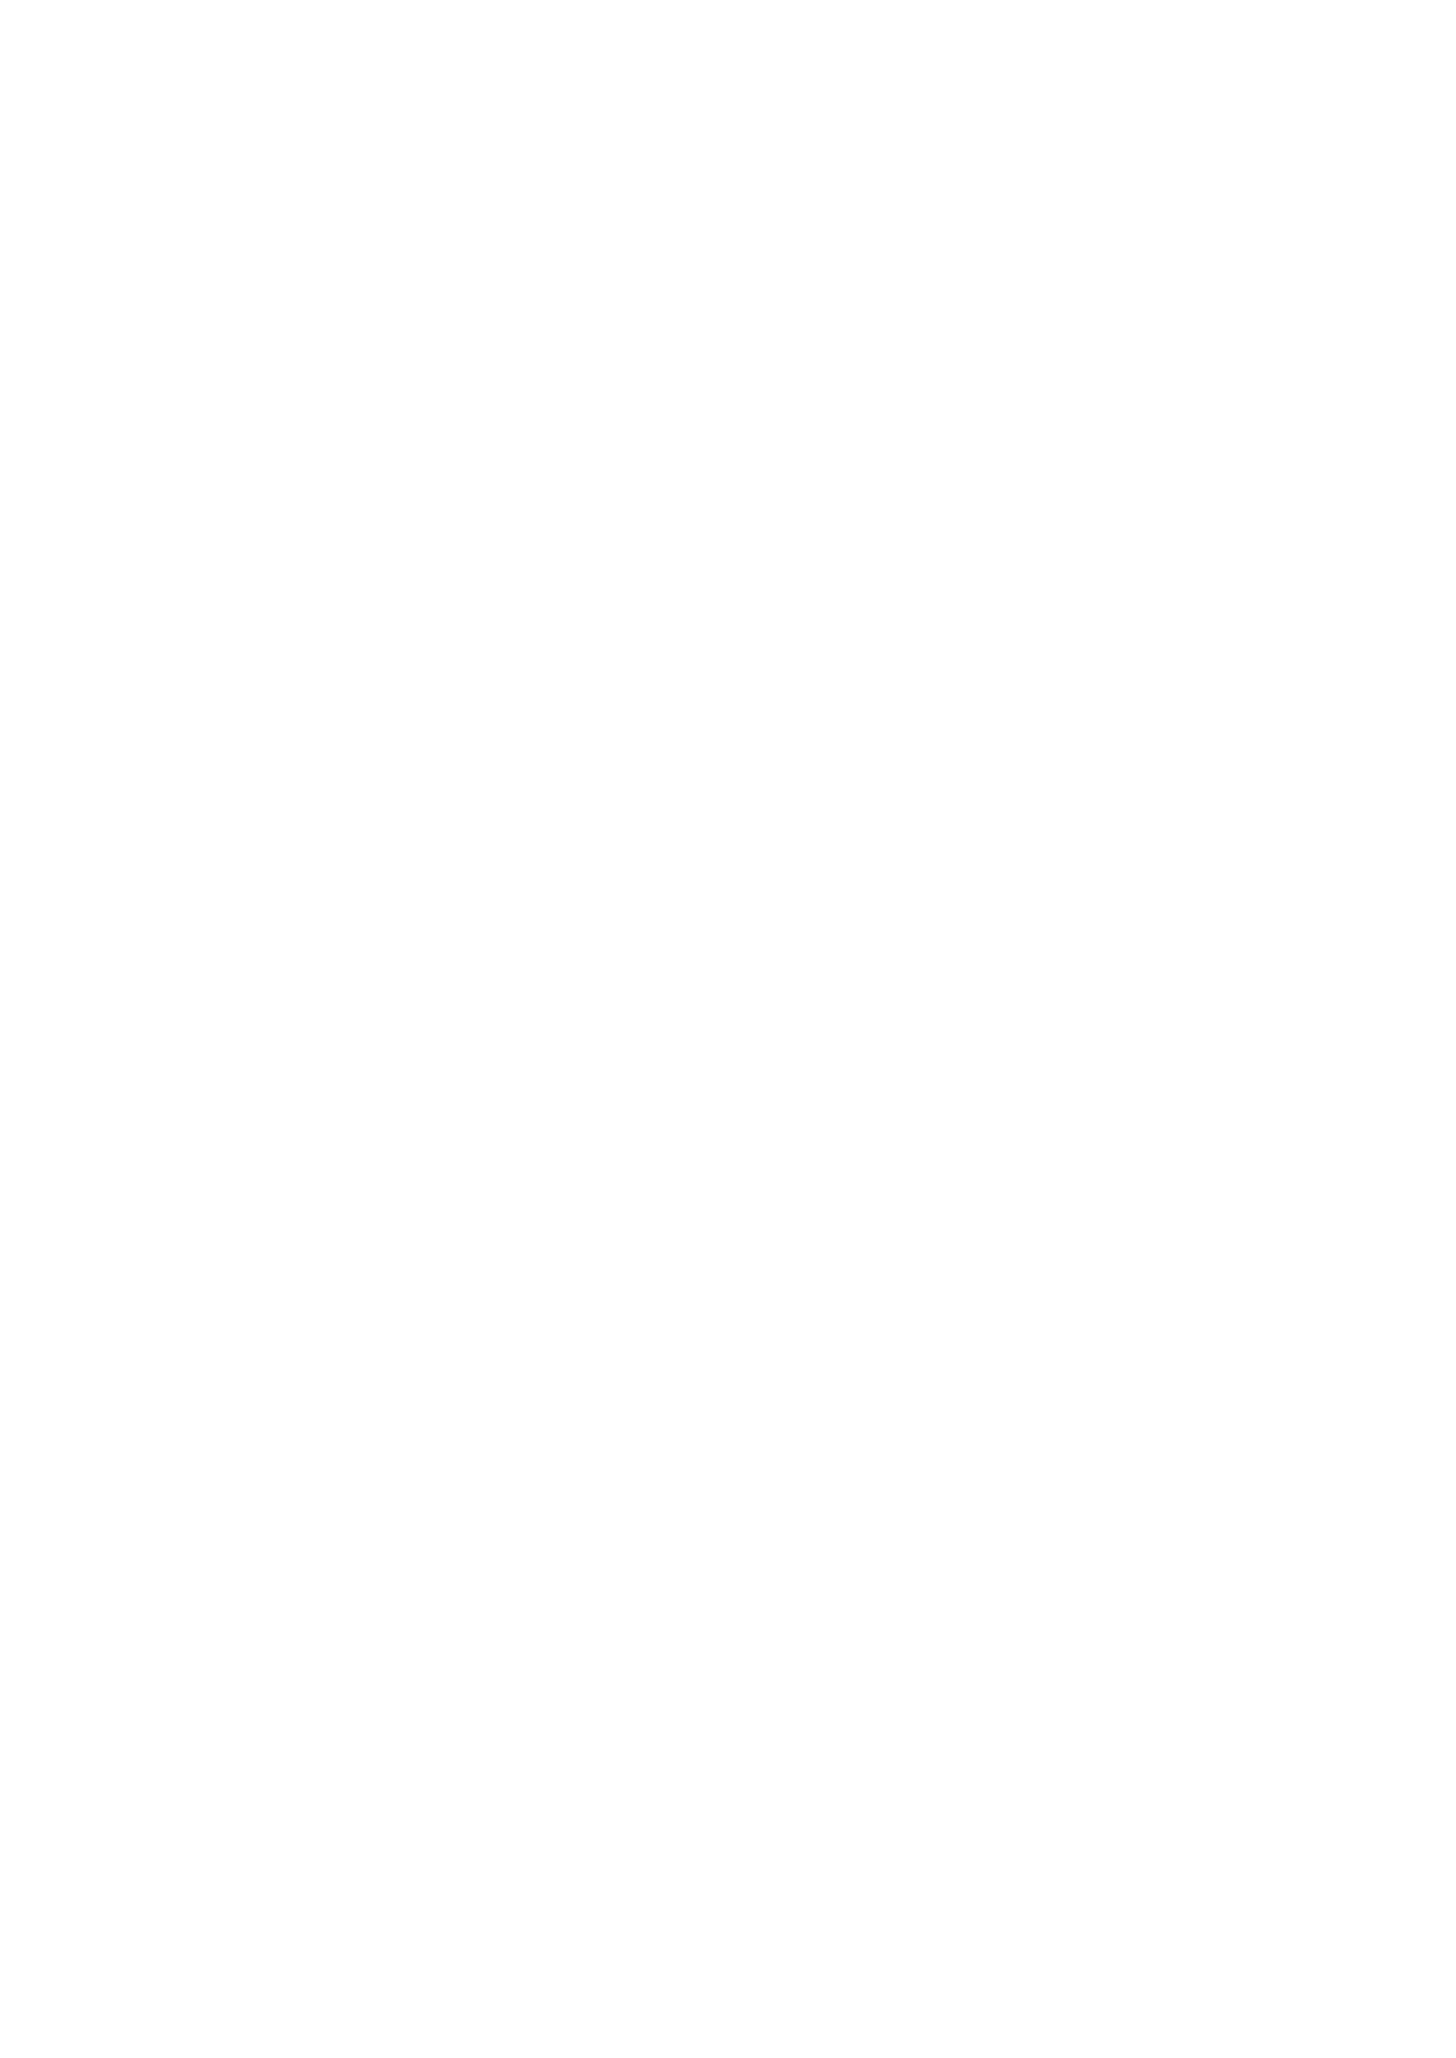 Discipline Profile of the Mathematical Sciences 2013